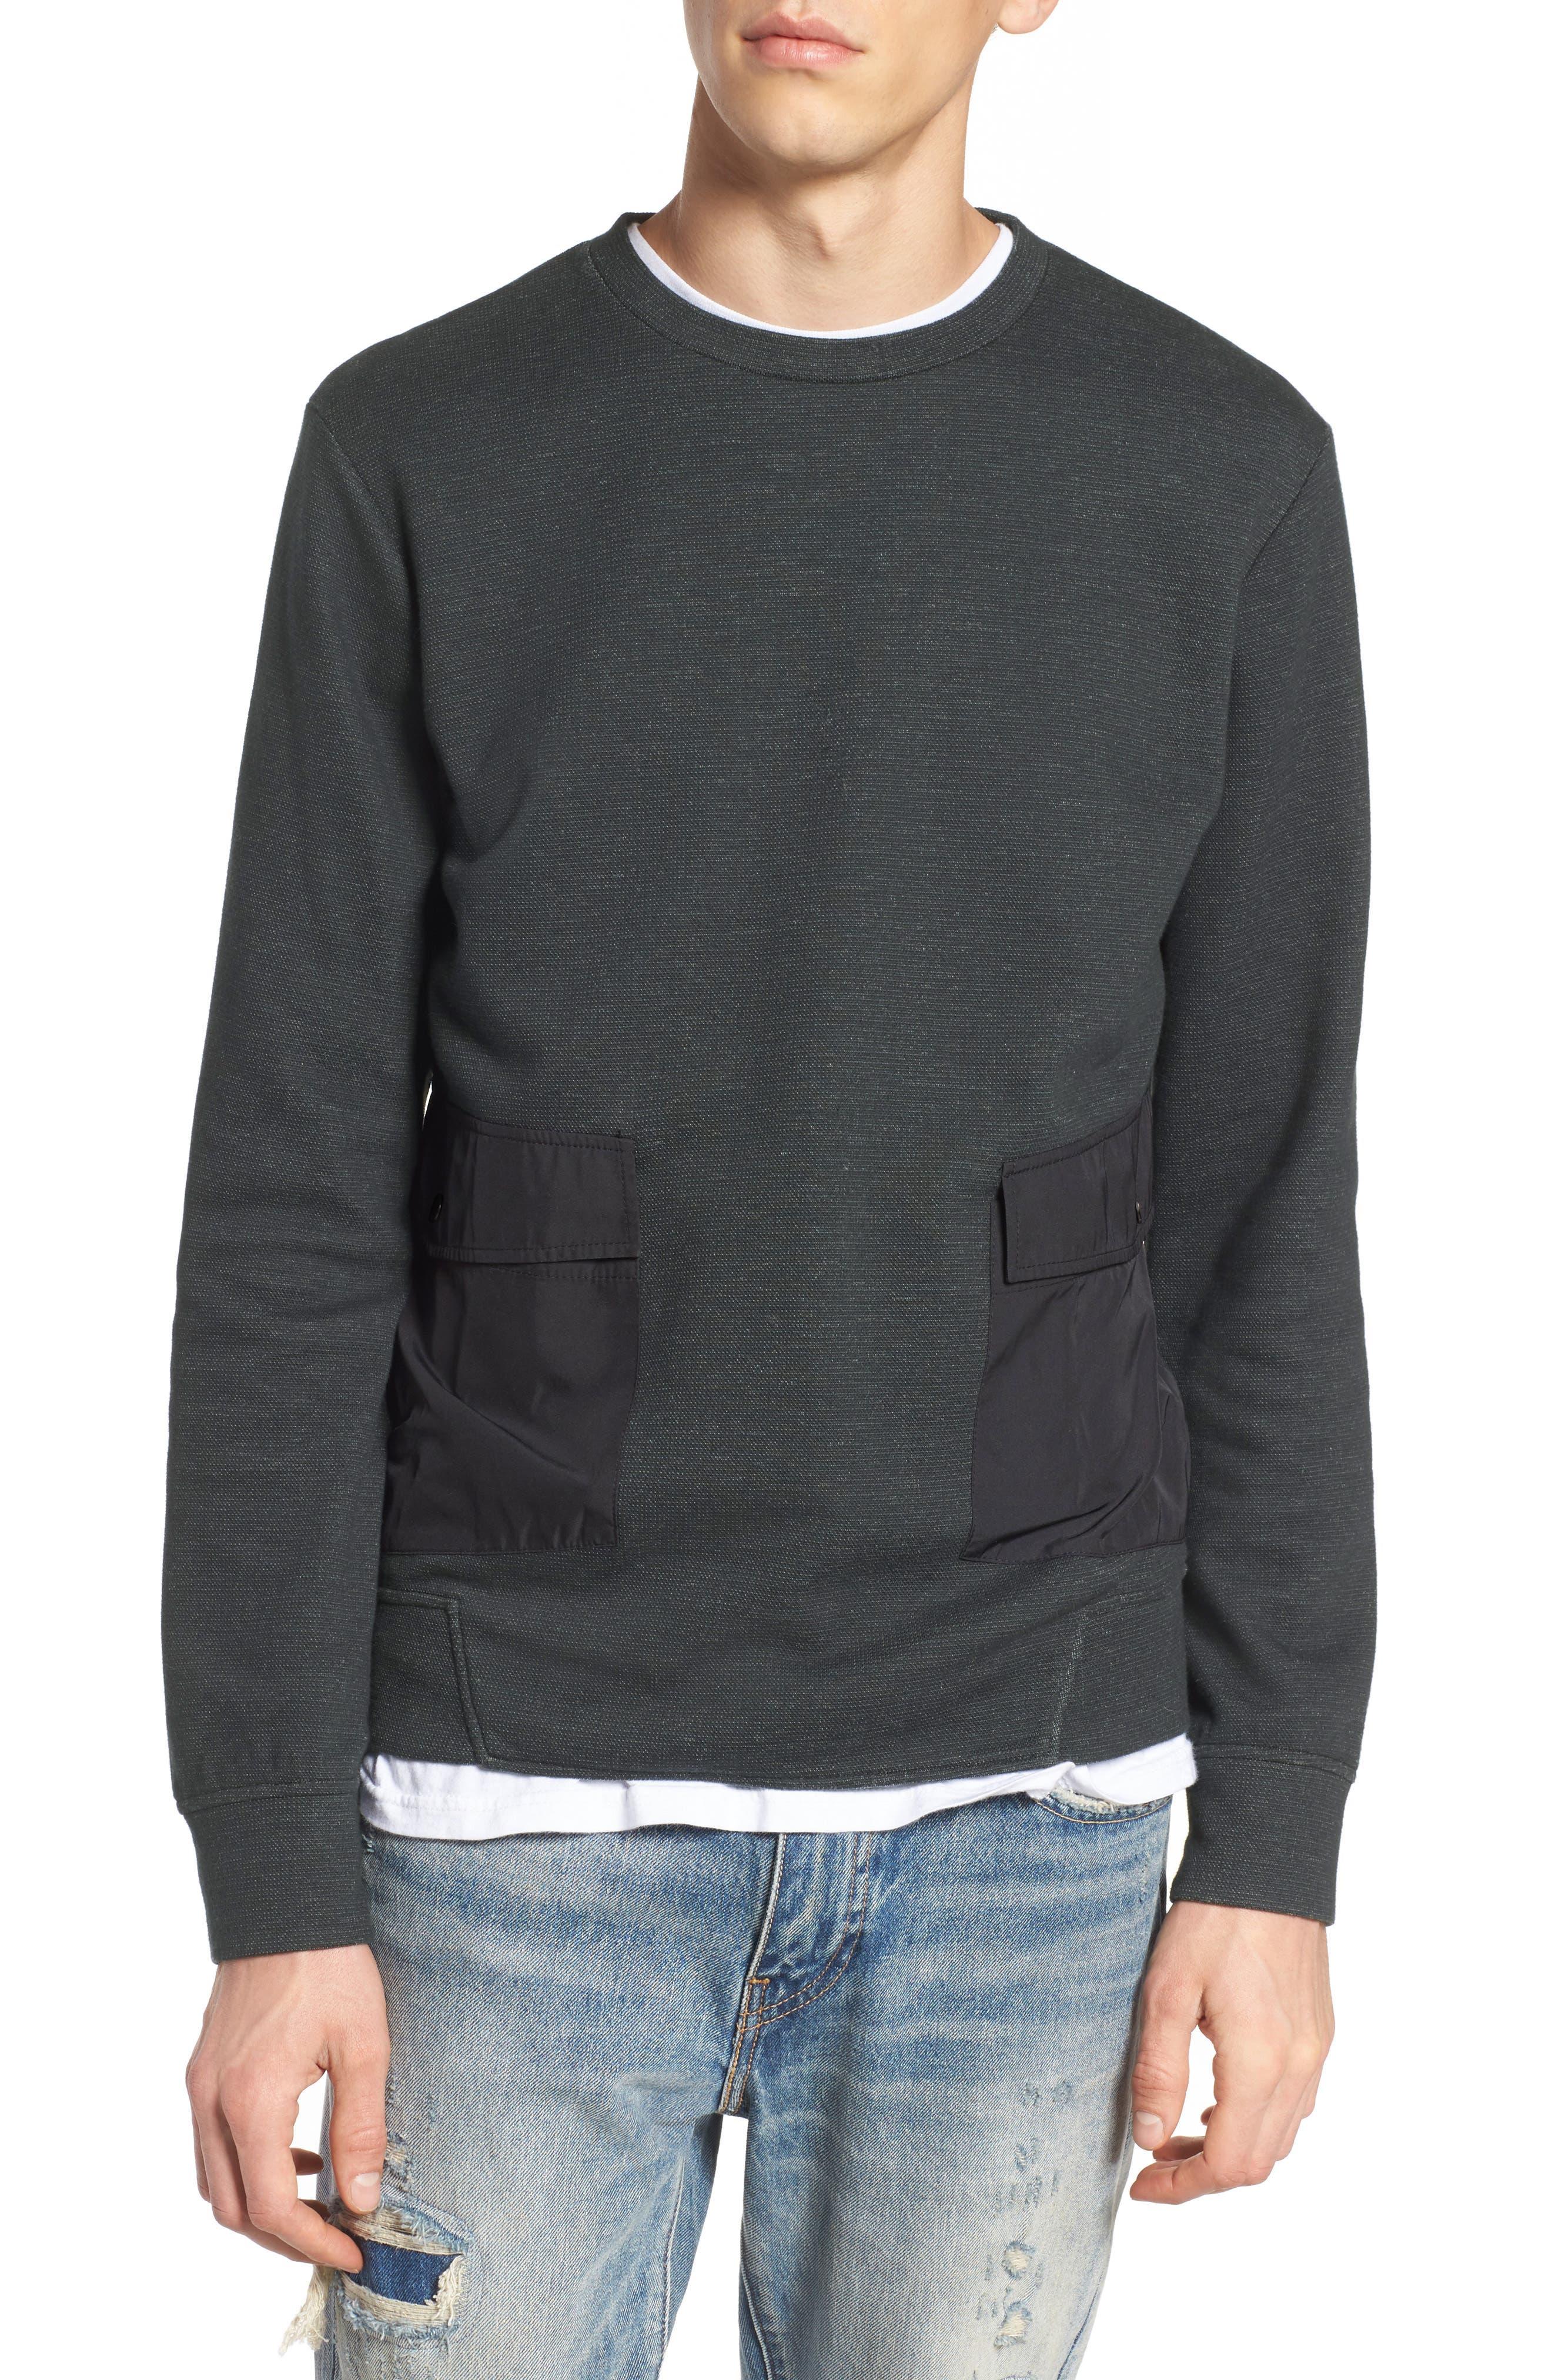 Oracle Sweatshirt,                         Main,                         color, Green